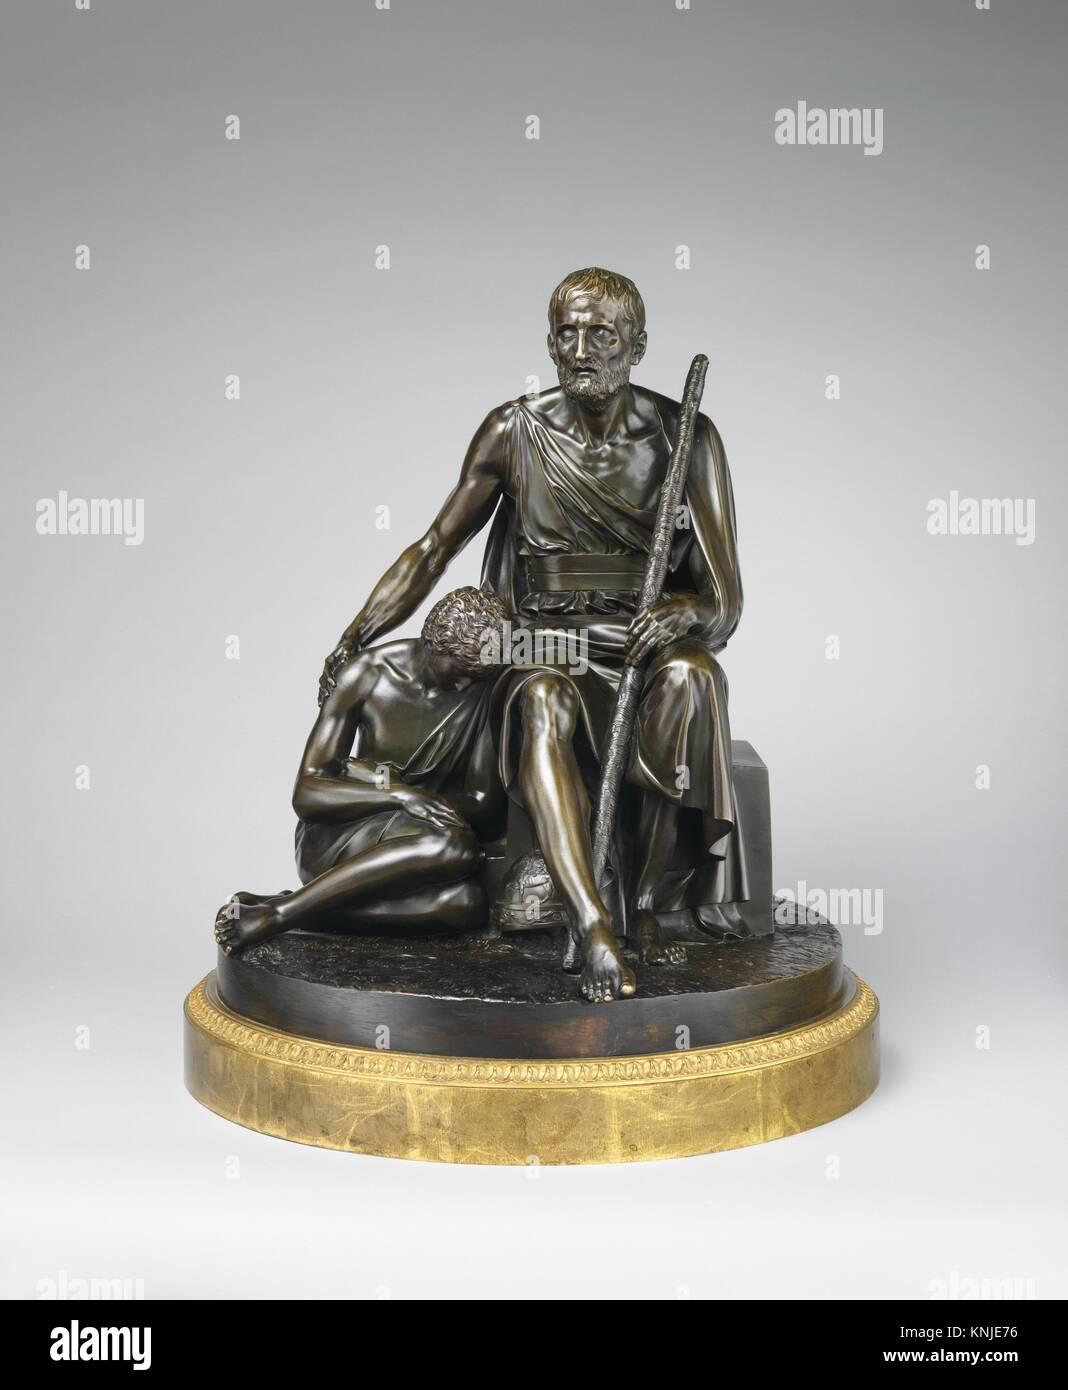 Belisarius and His Guide. Artist: Antoine Denis Chaudet (French, Paris 1763-1810 Paris); Date: 1794; Culture: French, - Stock Image